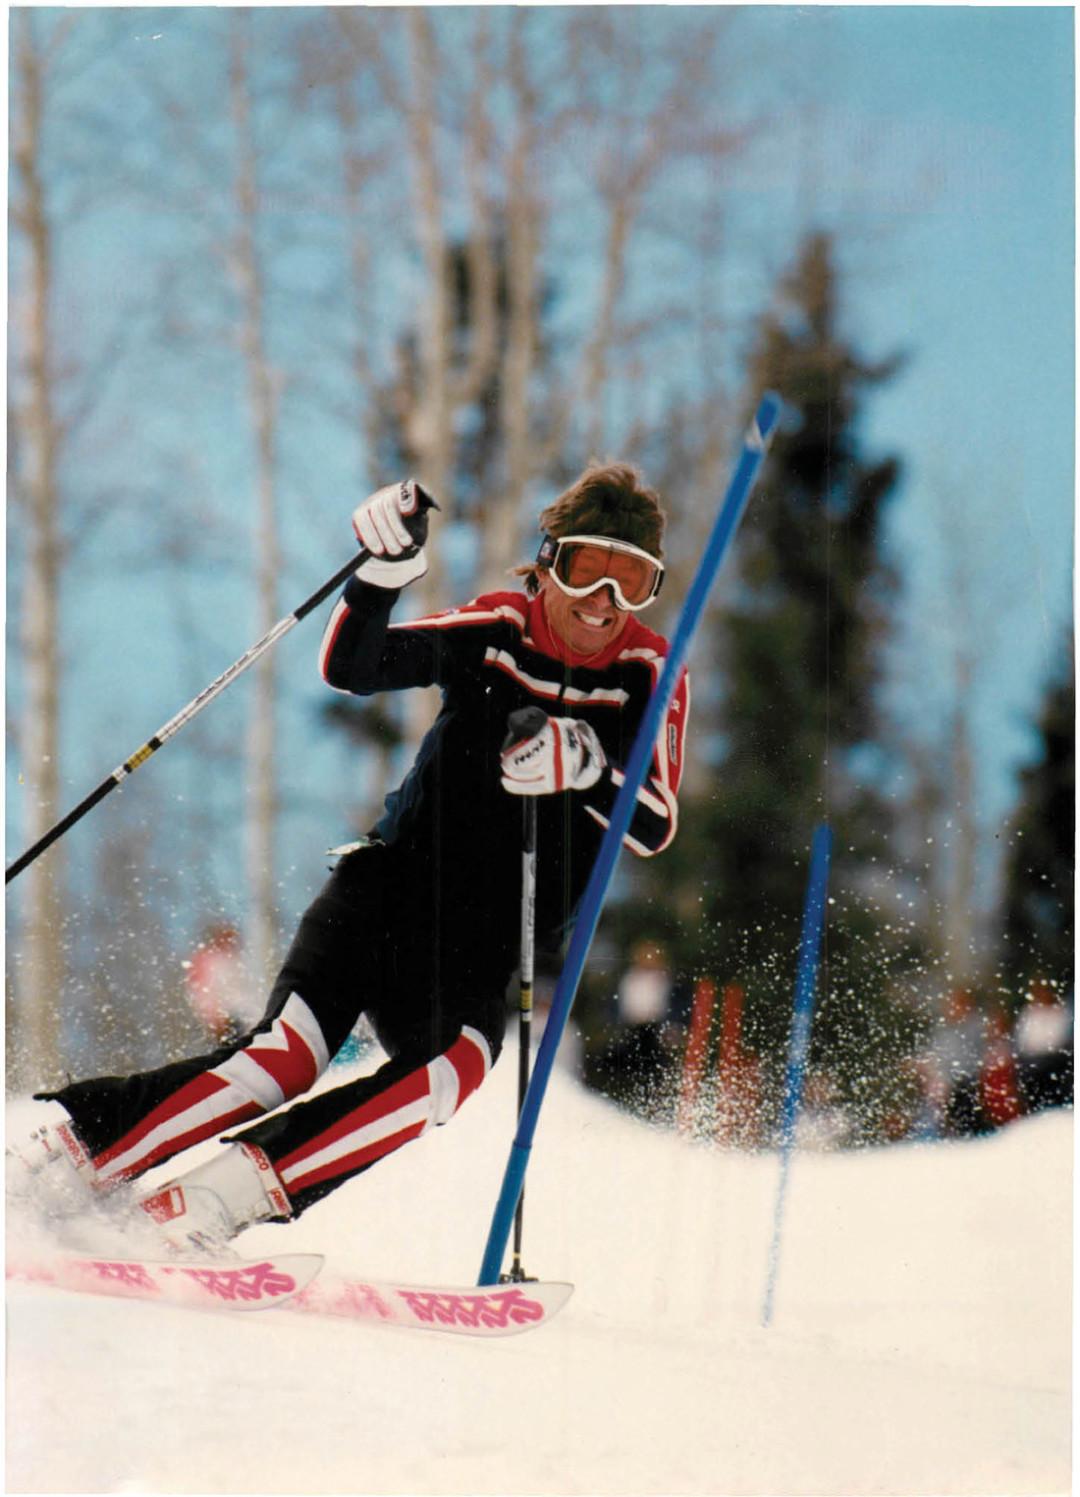 0213 political animal skiing yttxm9